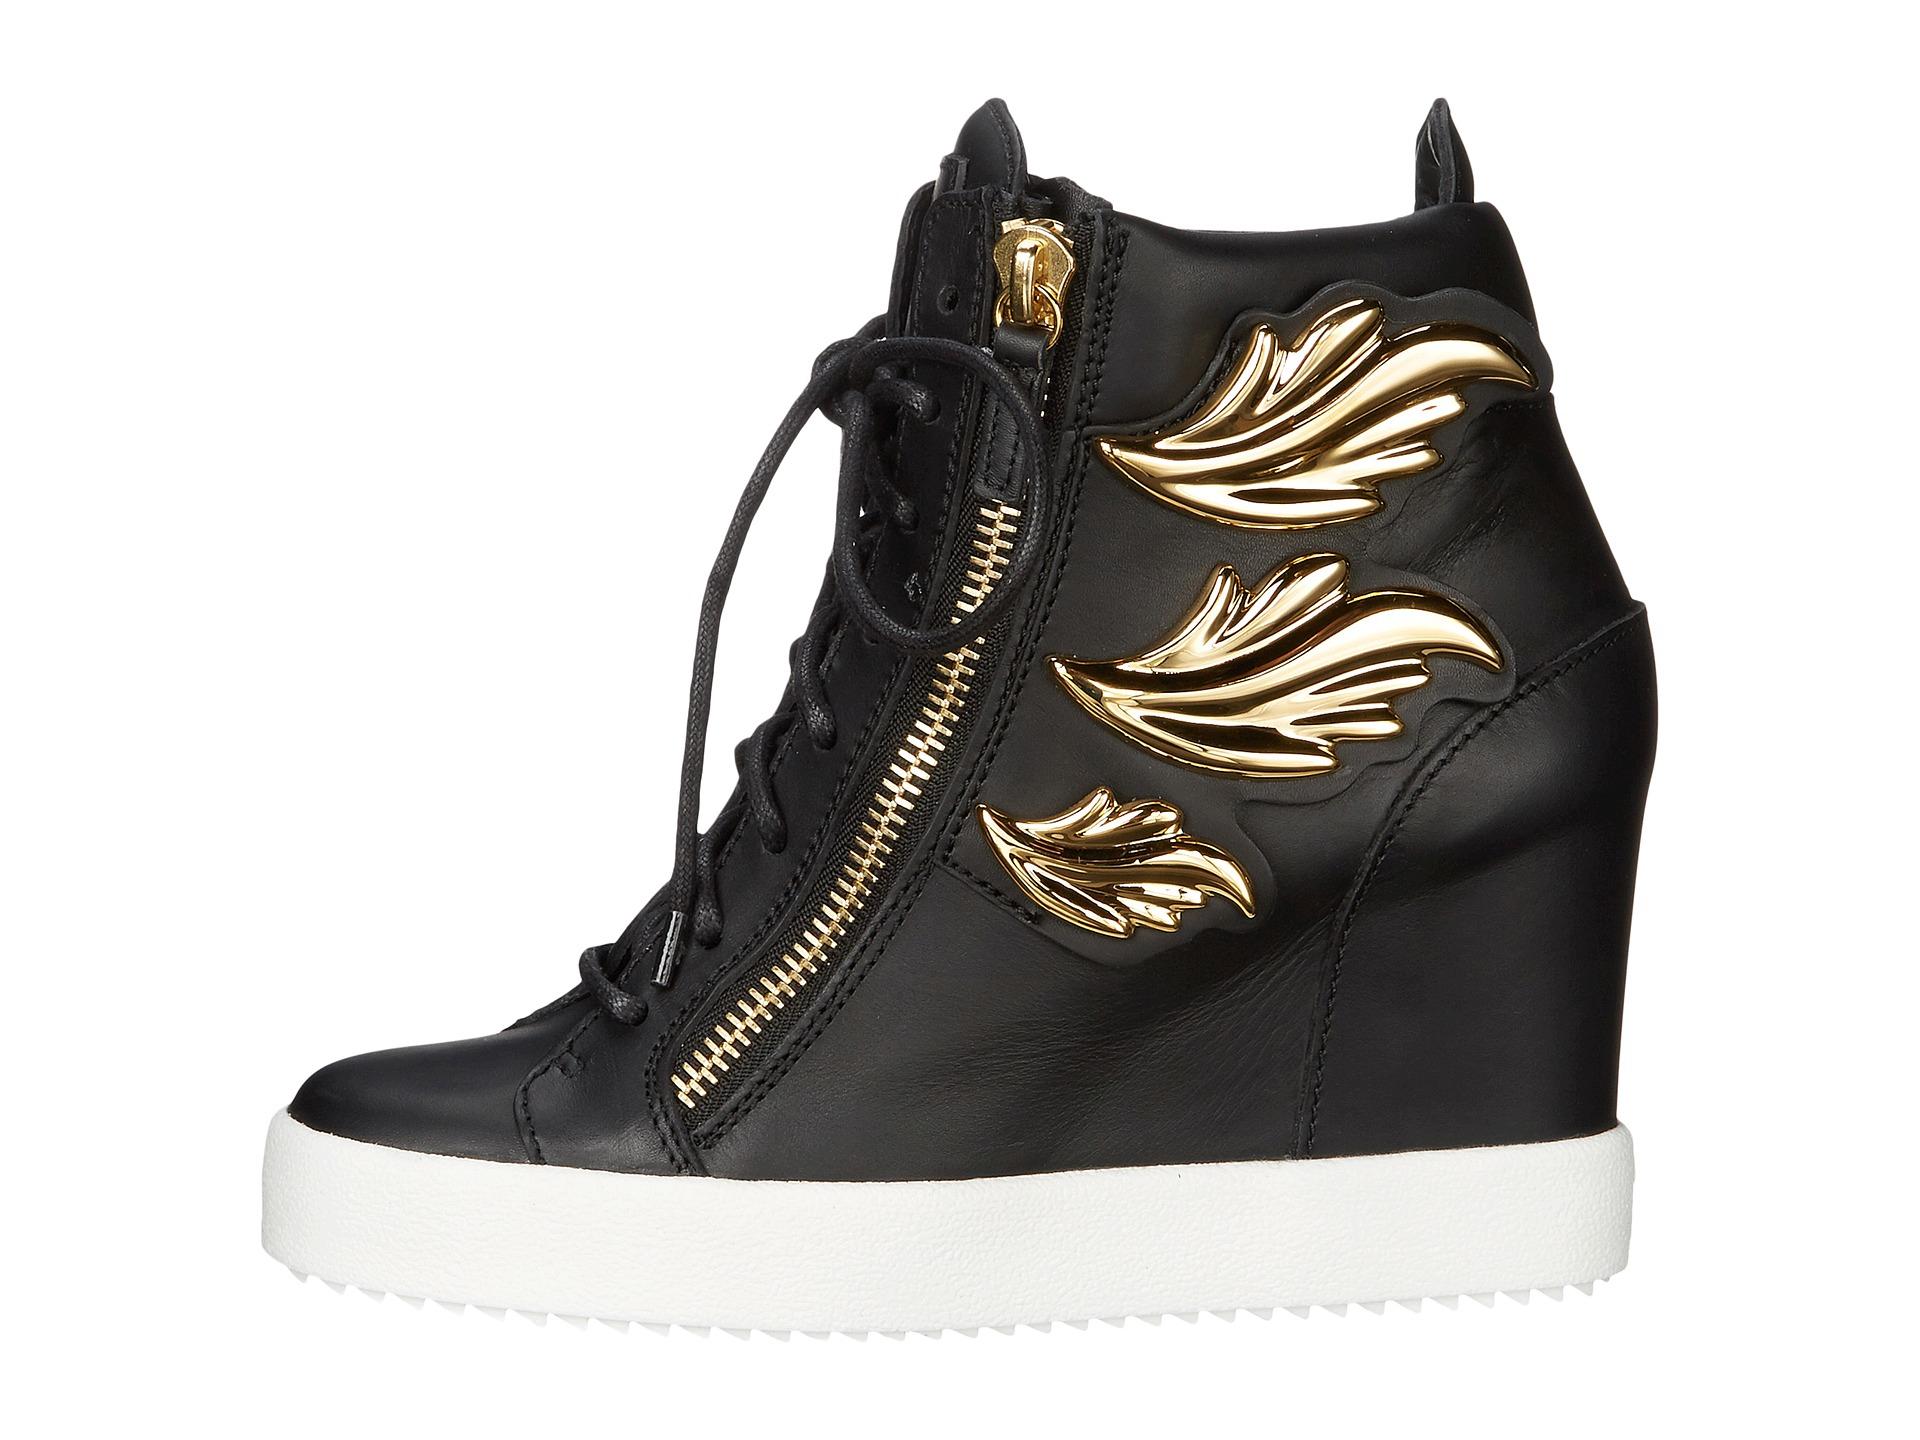 Giuseppe zanotti Hi-top Wedge Winged Sneaker | Lyst